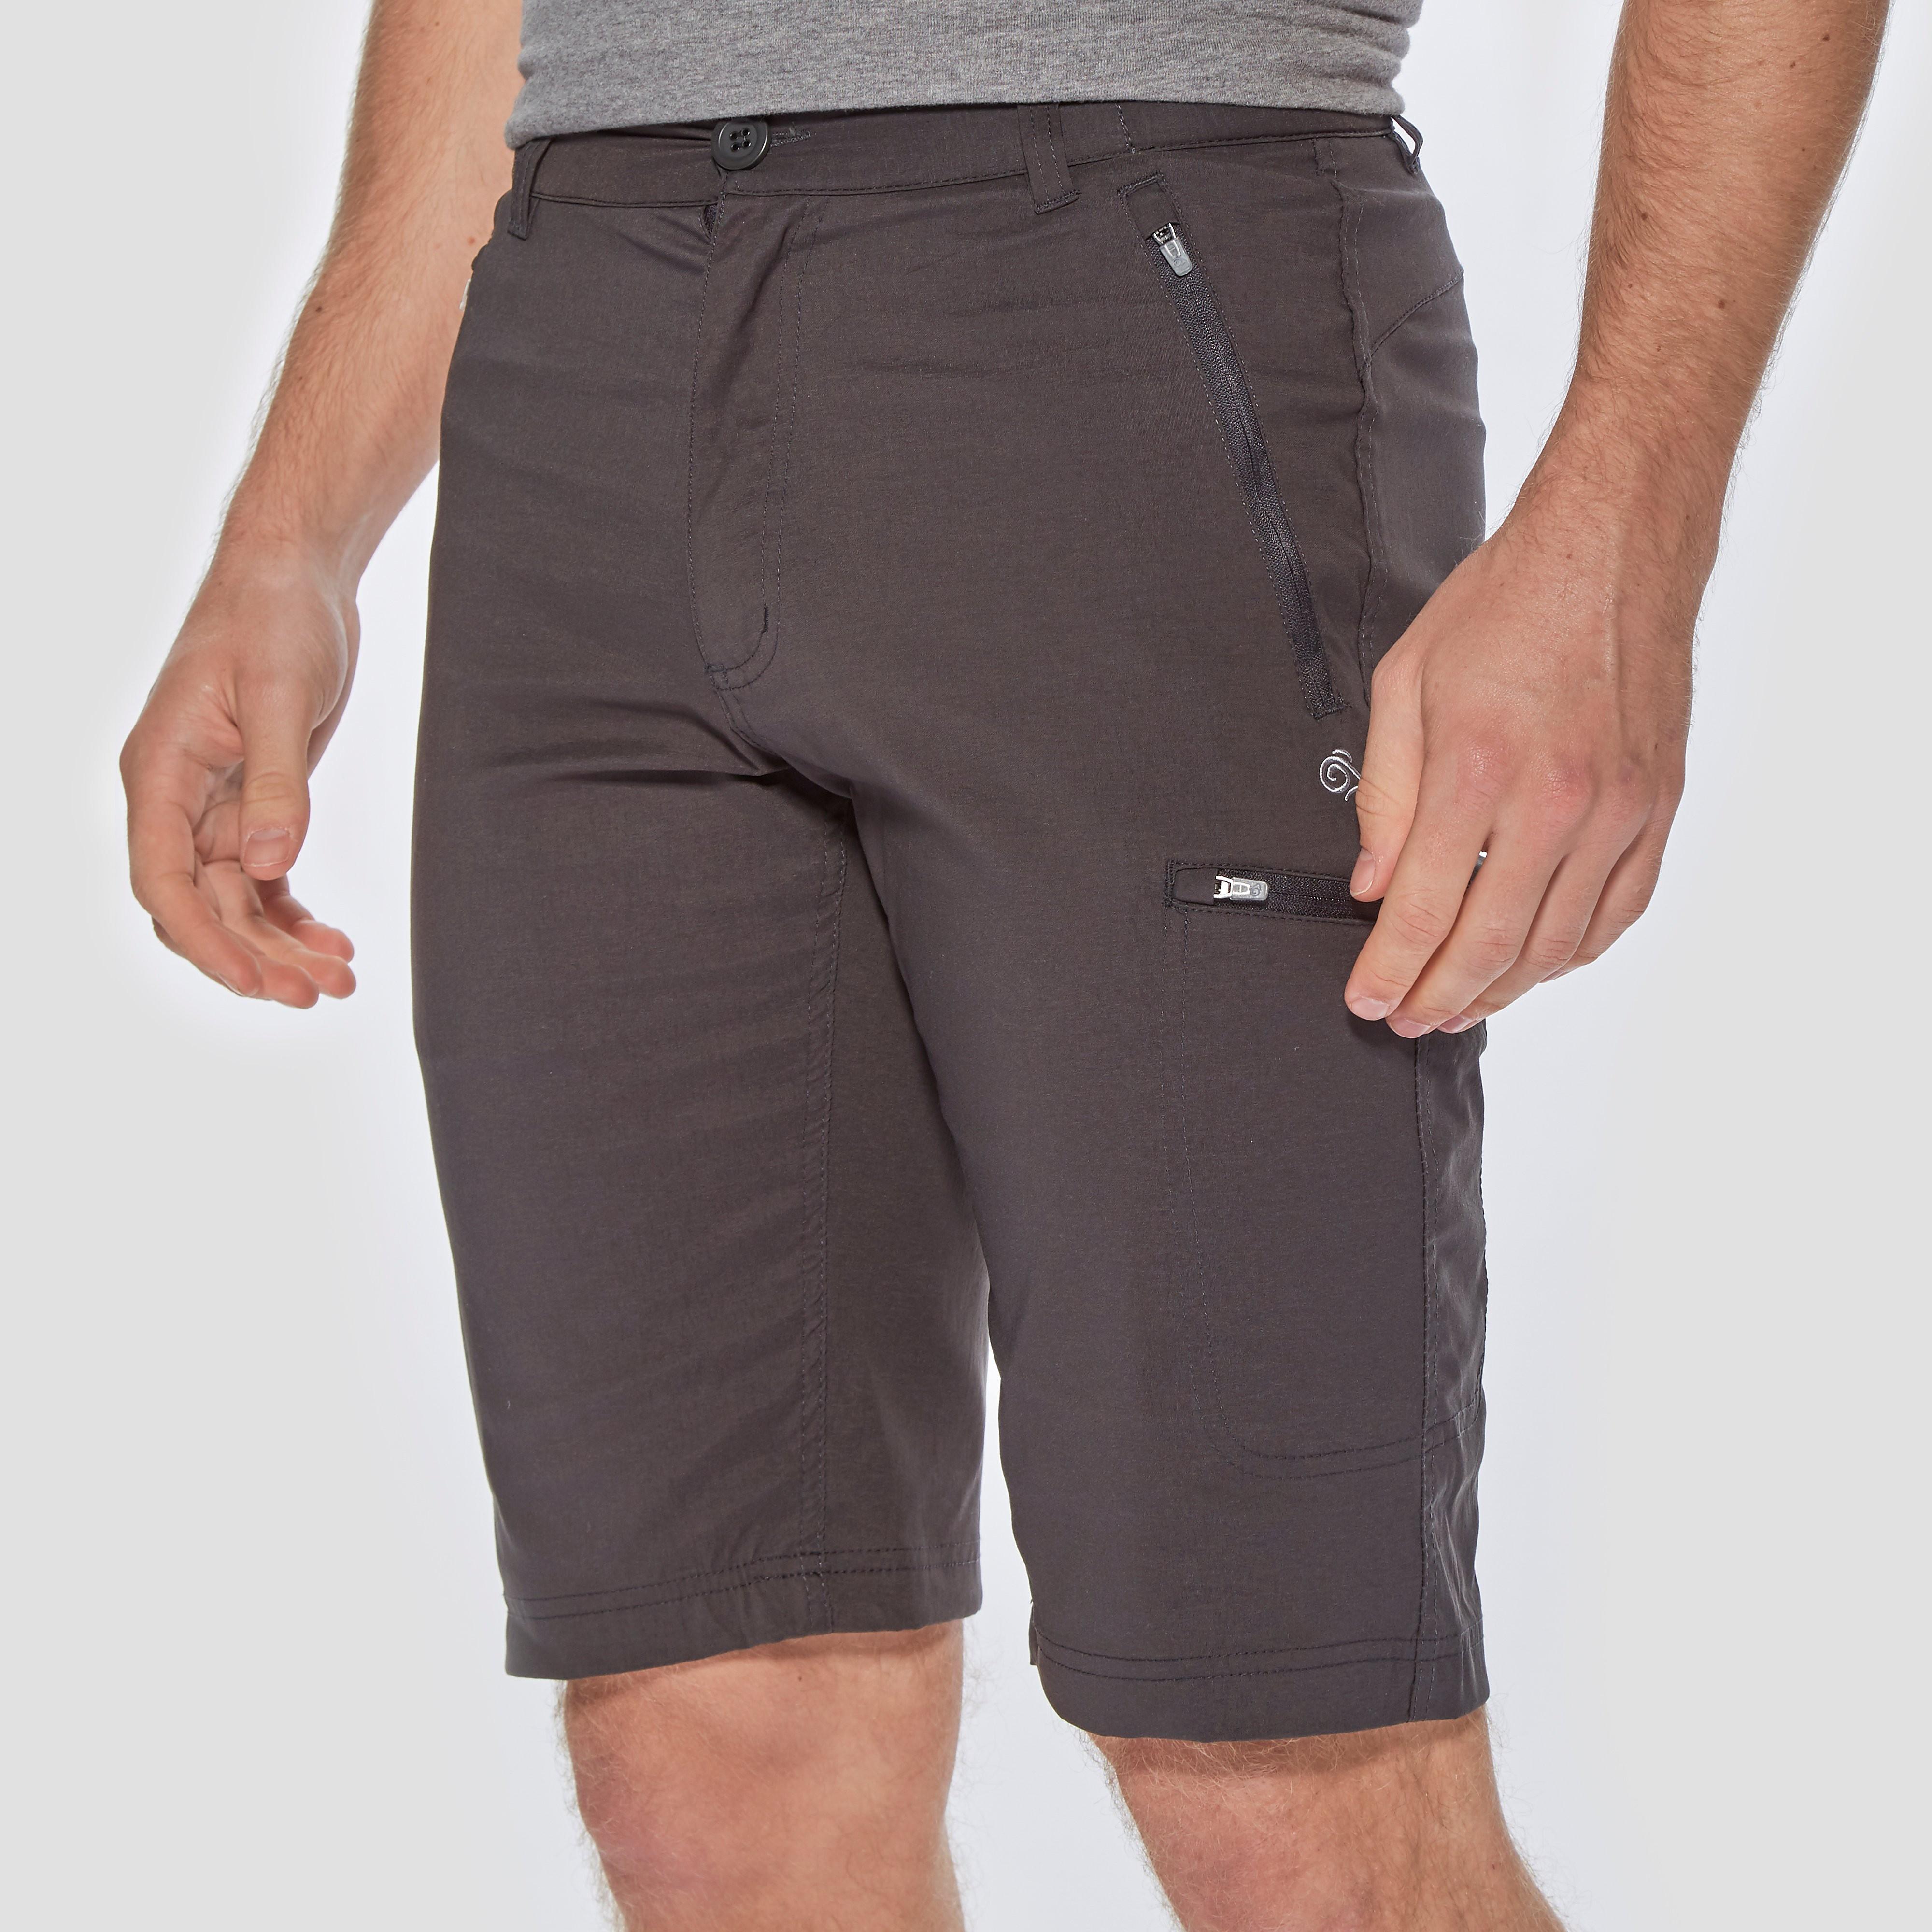 Craghoppers Kiwi Pro Long Men's Shorts